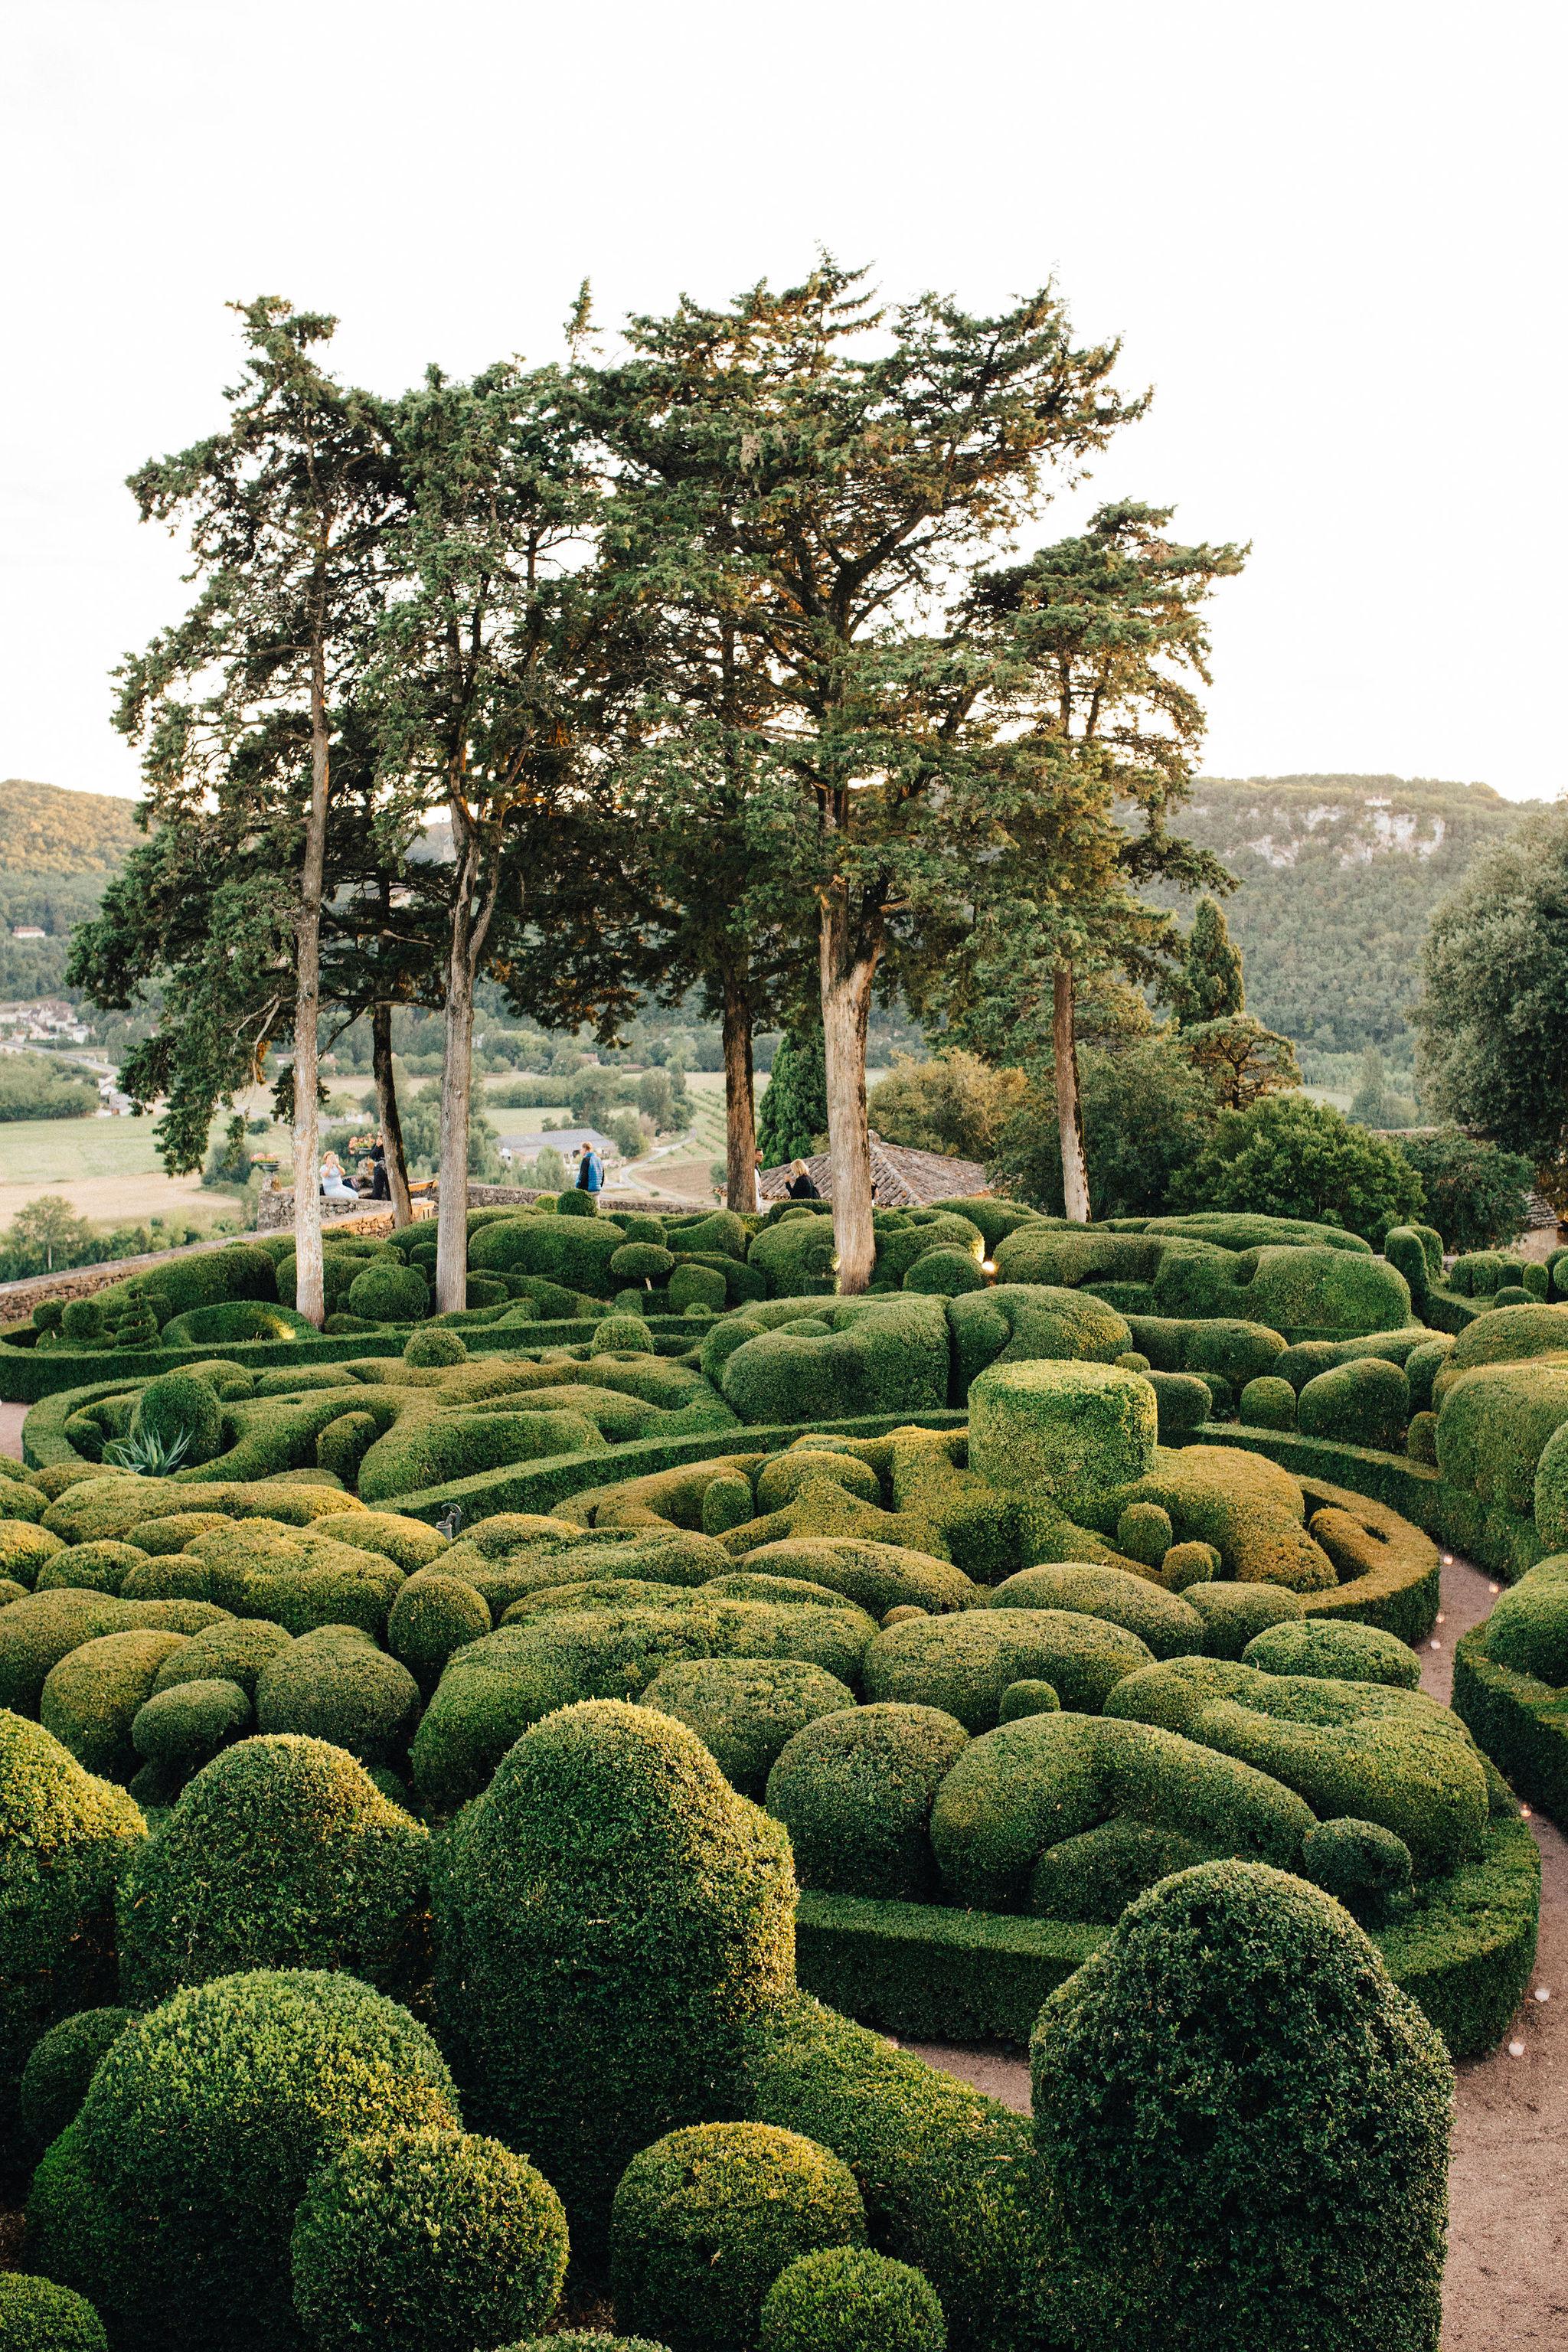 Les Jardins de Marqueyssac - view from inside